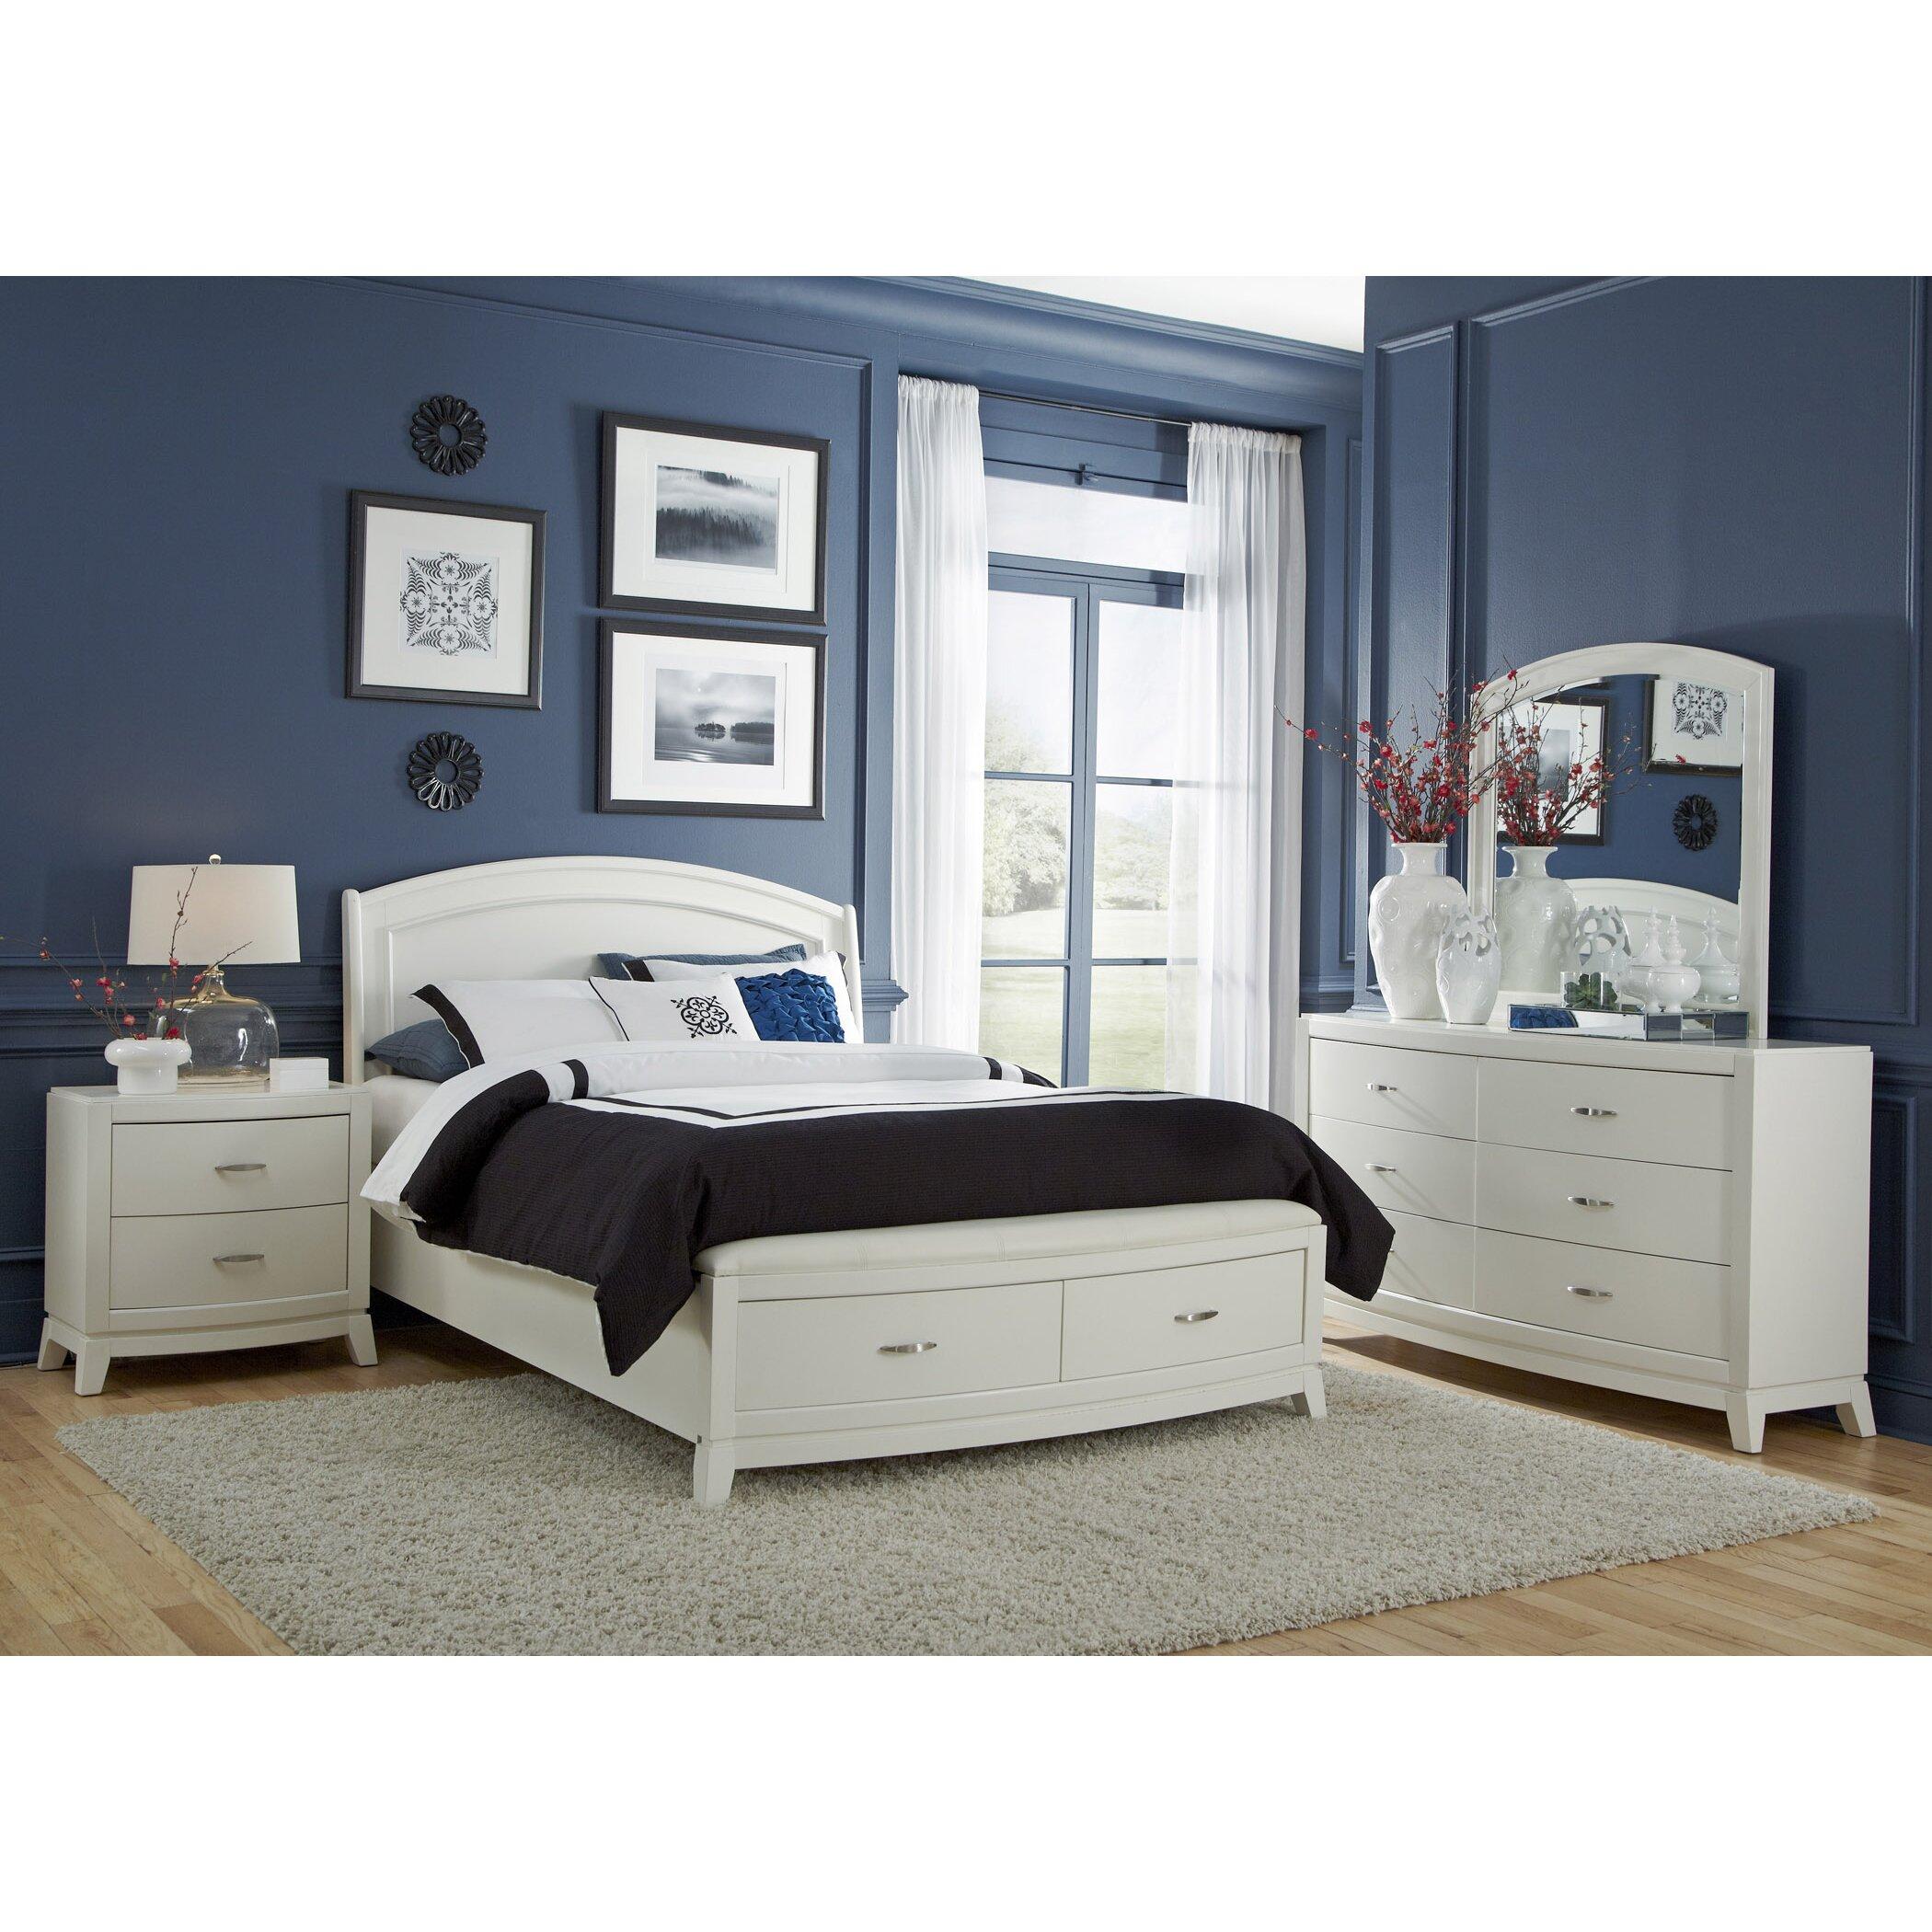 Liberty Furniture 2 Drawer Nightstand & Reviews